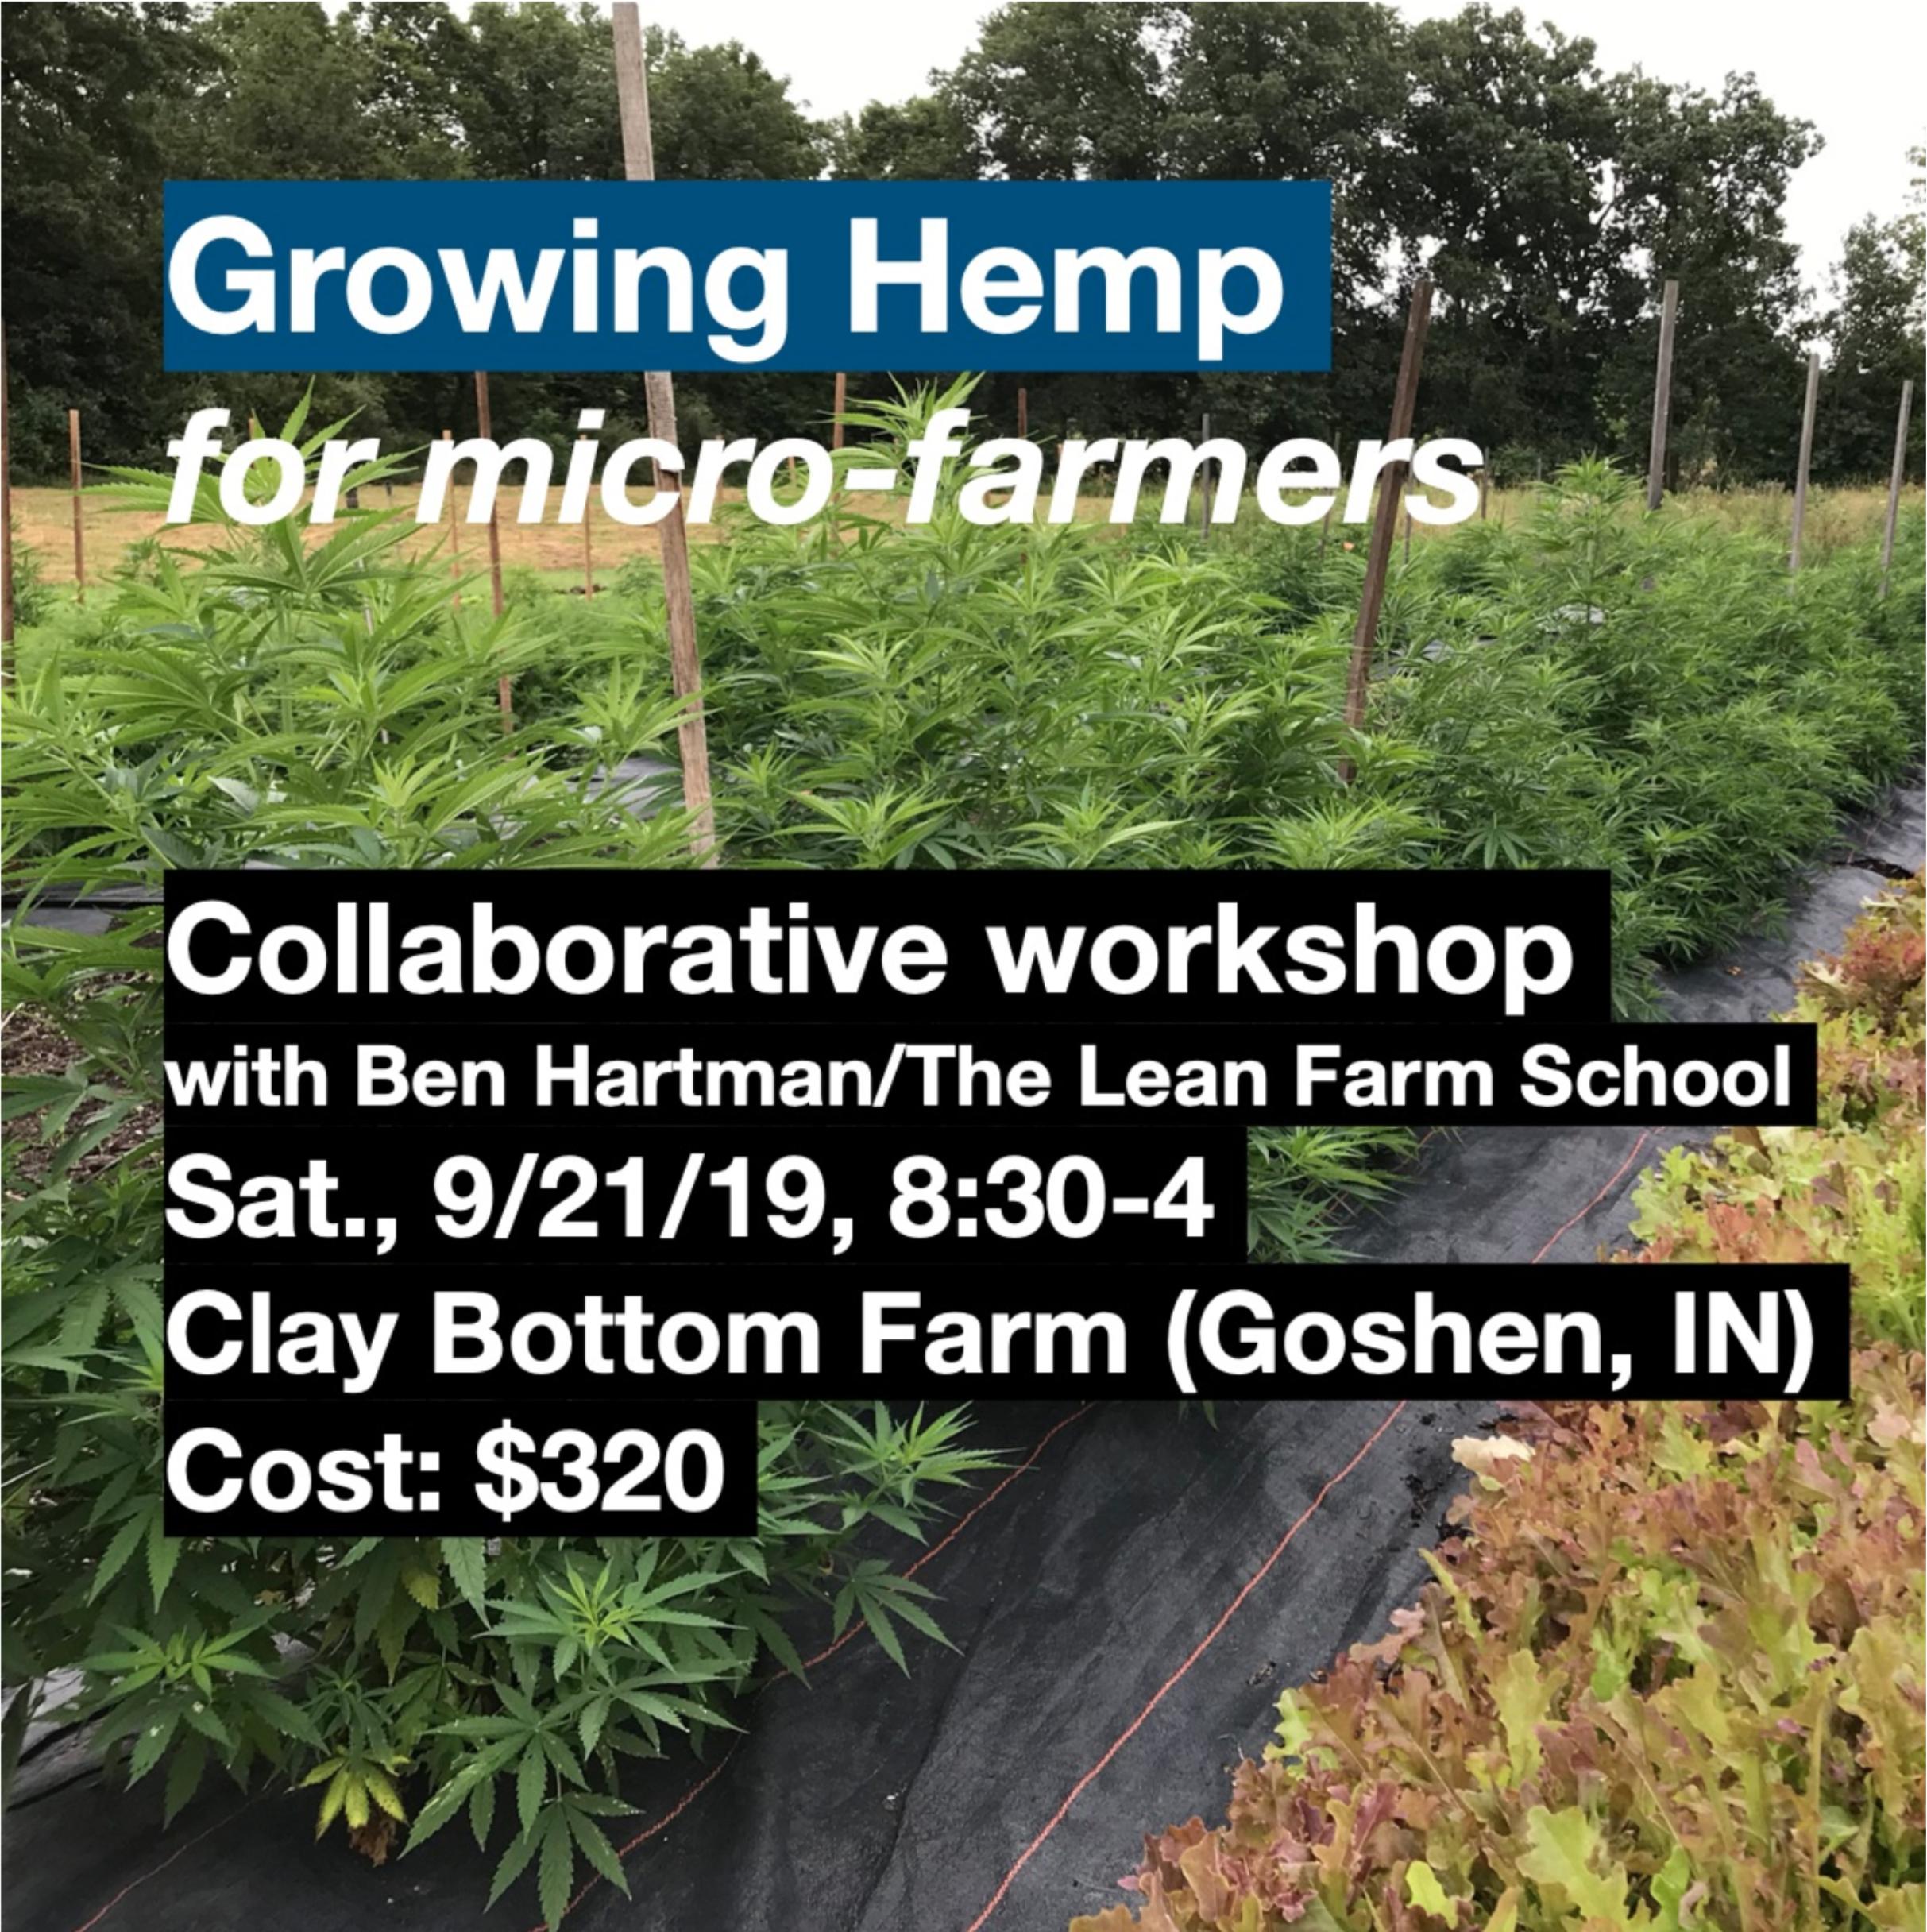 Hemp Workshop with Ben Hartman/The Lean Farm School — Clay Bottom Farm